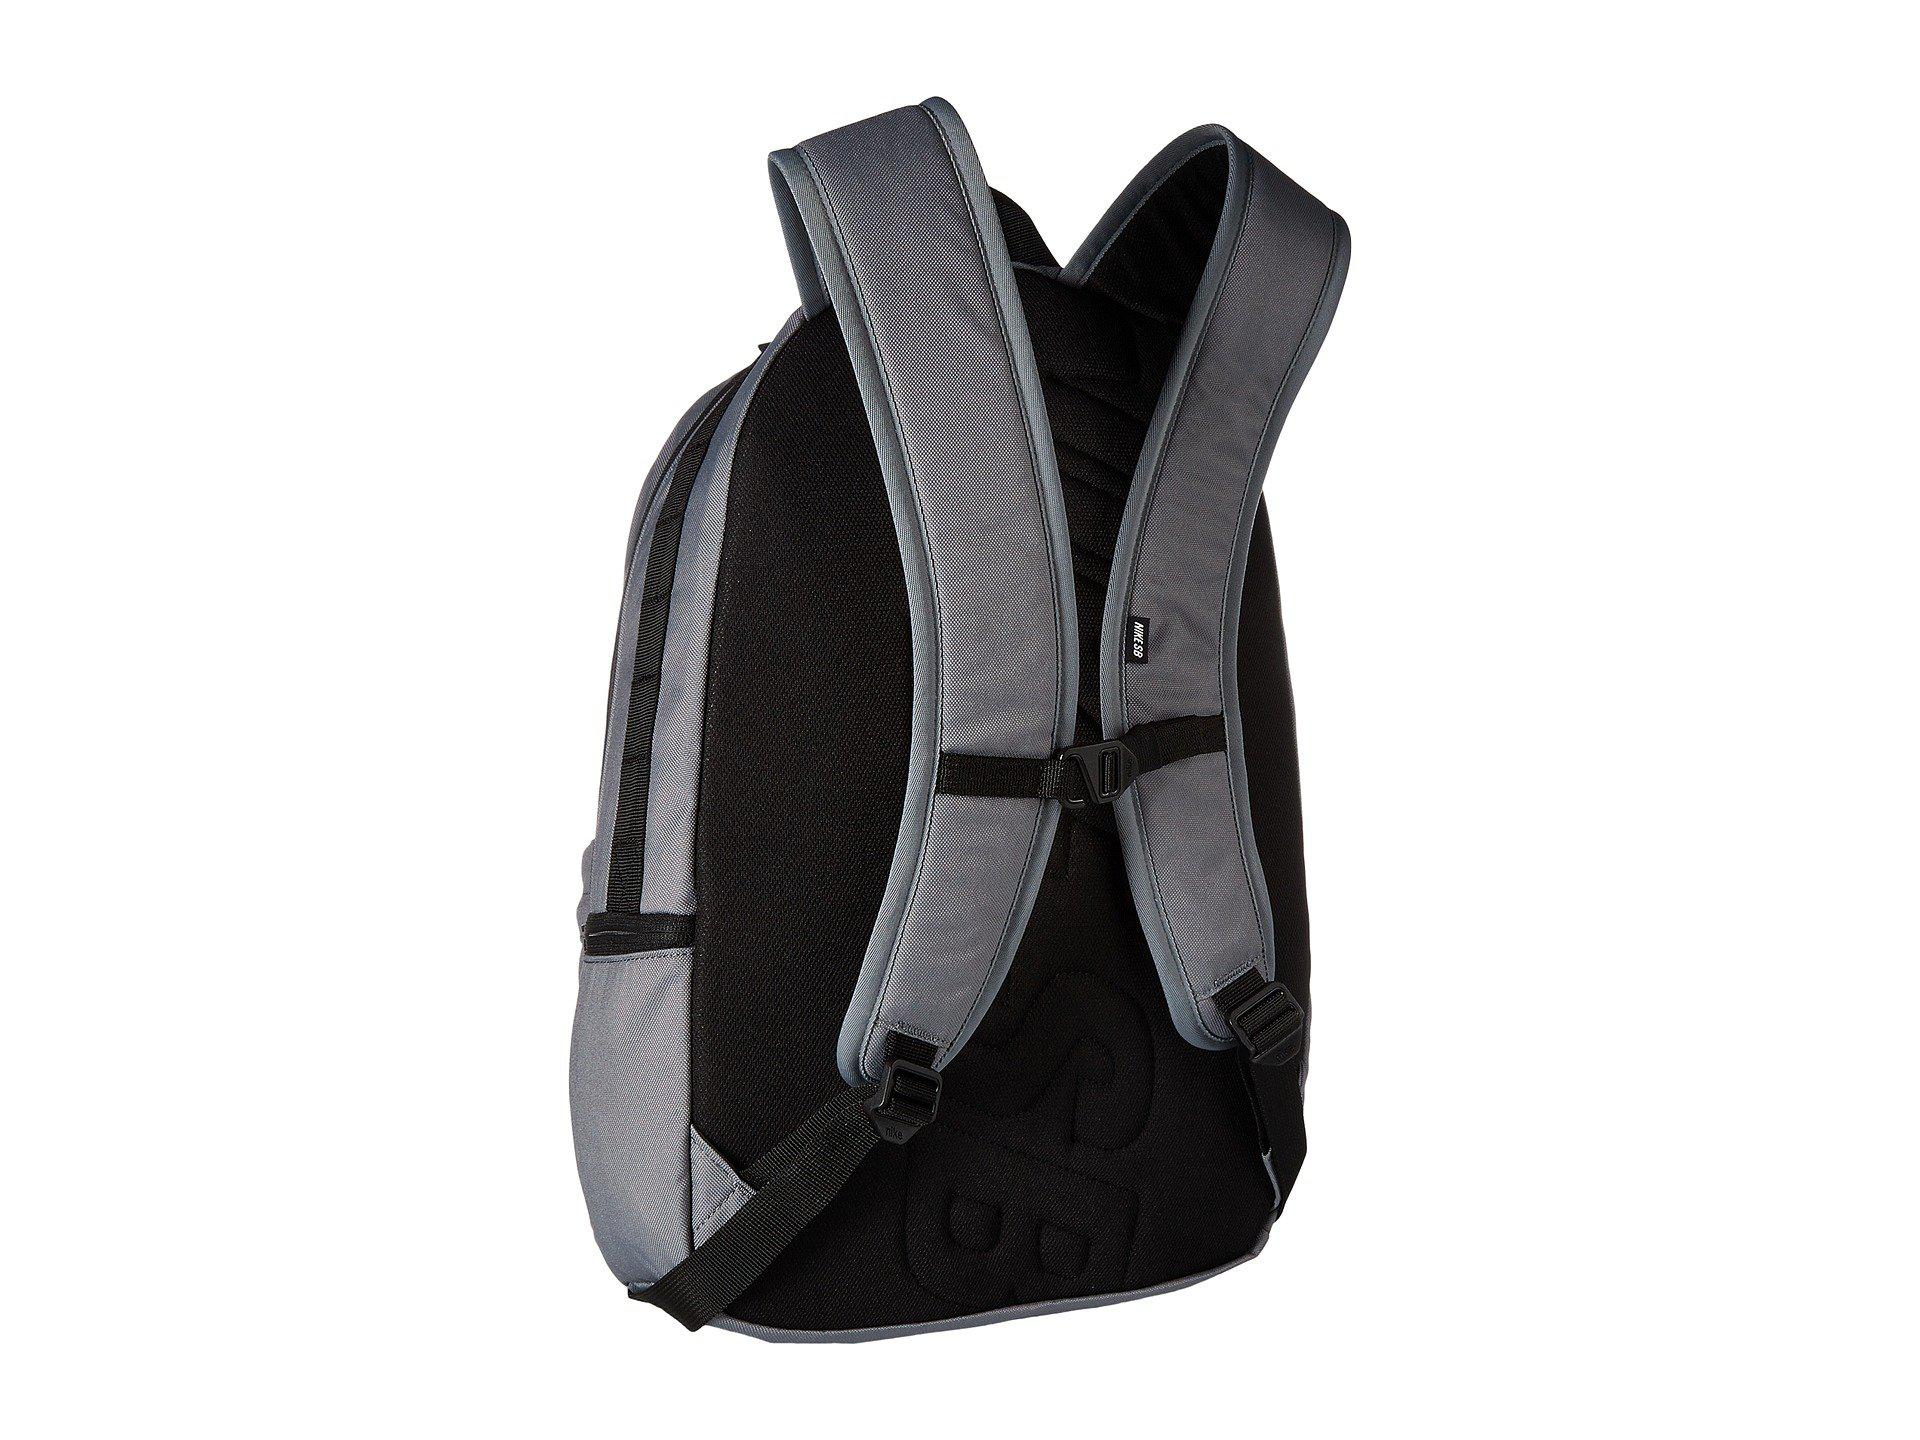 Nike - Icon Backpack (cool Grey black white) Backpack Bags for Men. View  fullscreen 54012c0f2fda7